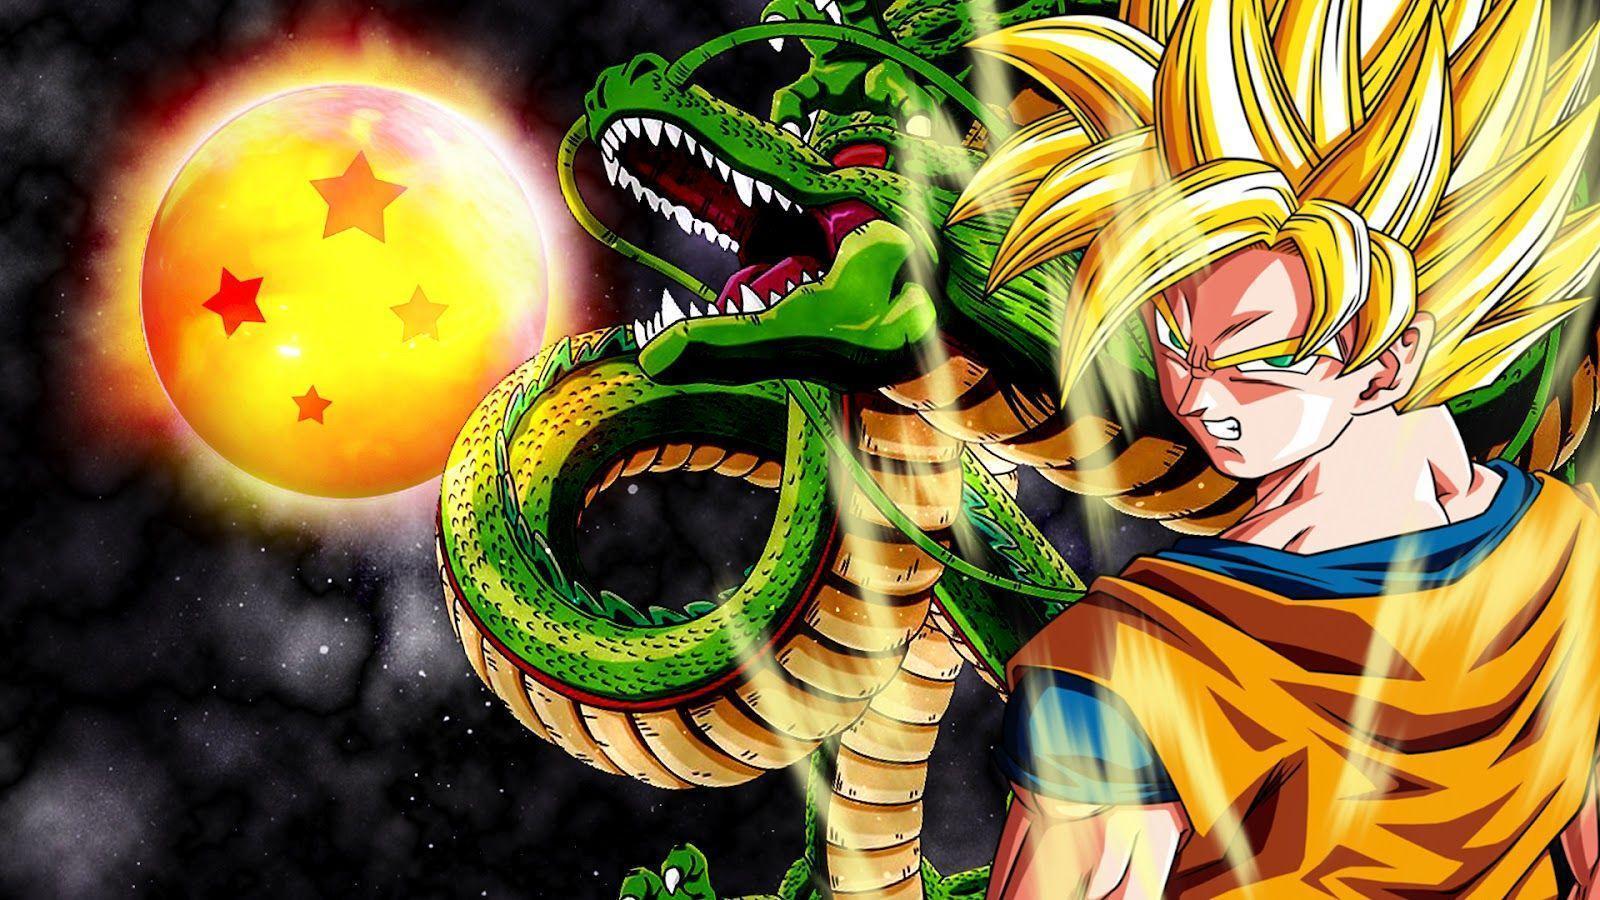 Super Saiyan Goku Wallpapers